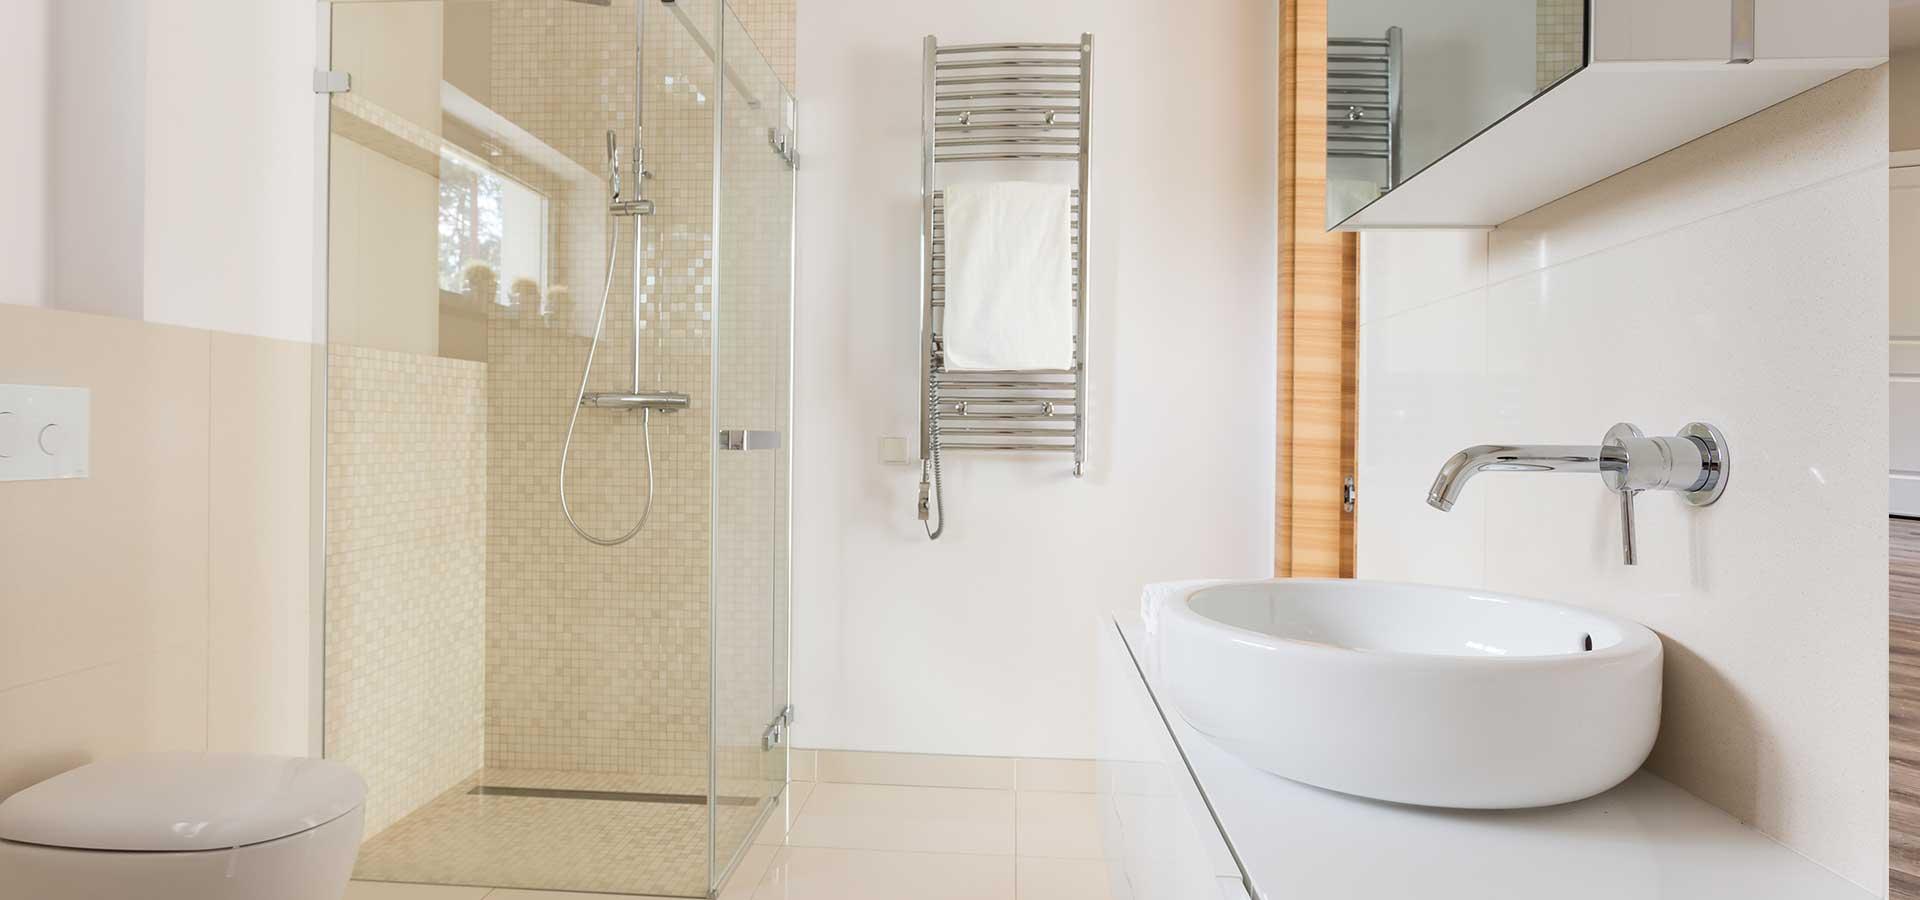 Accessoire Salle De Bain Sherbrooke ~ salle de bain contemporaine magog sherbrooke bromont granby